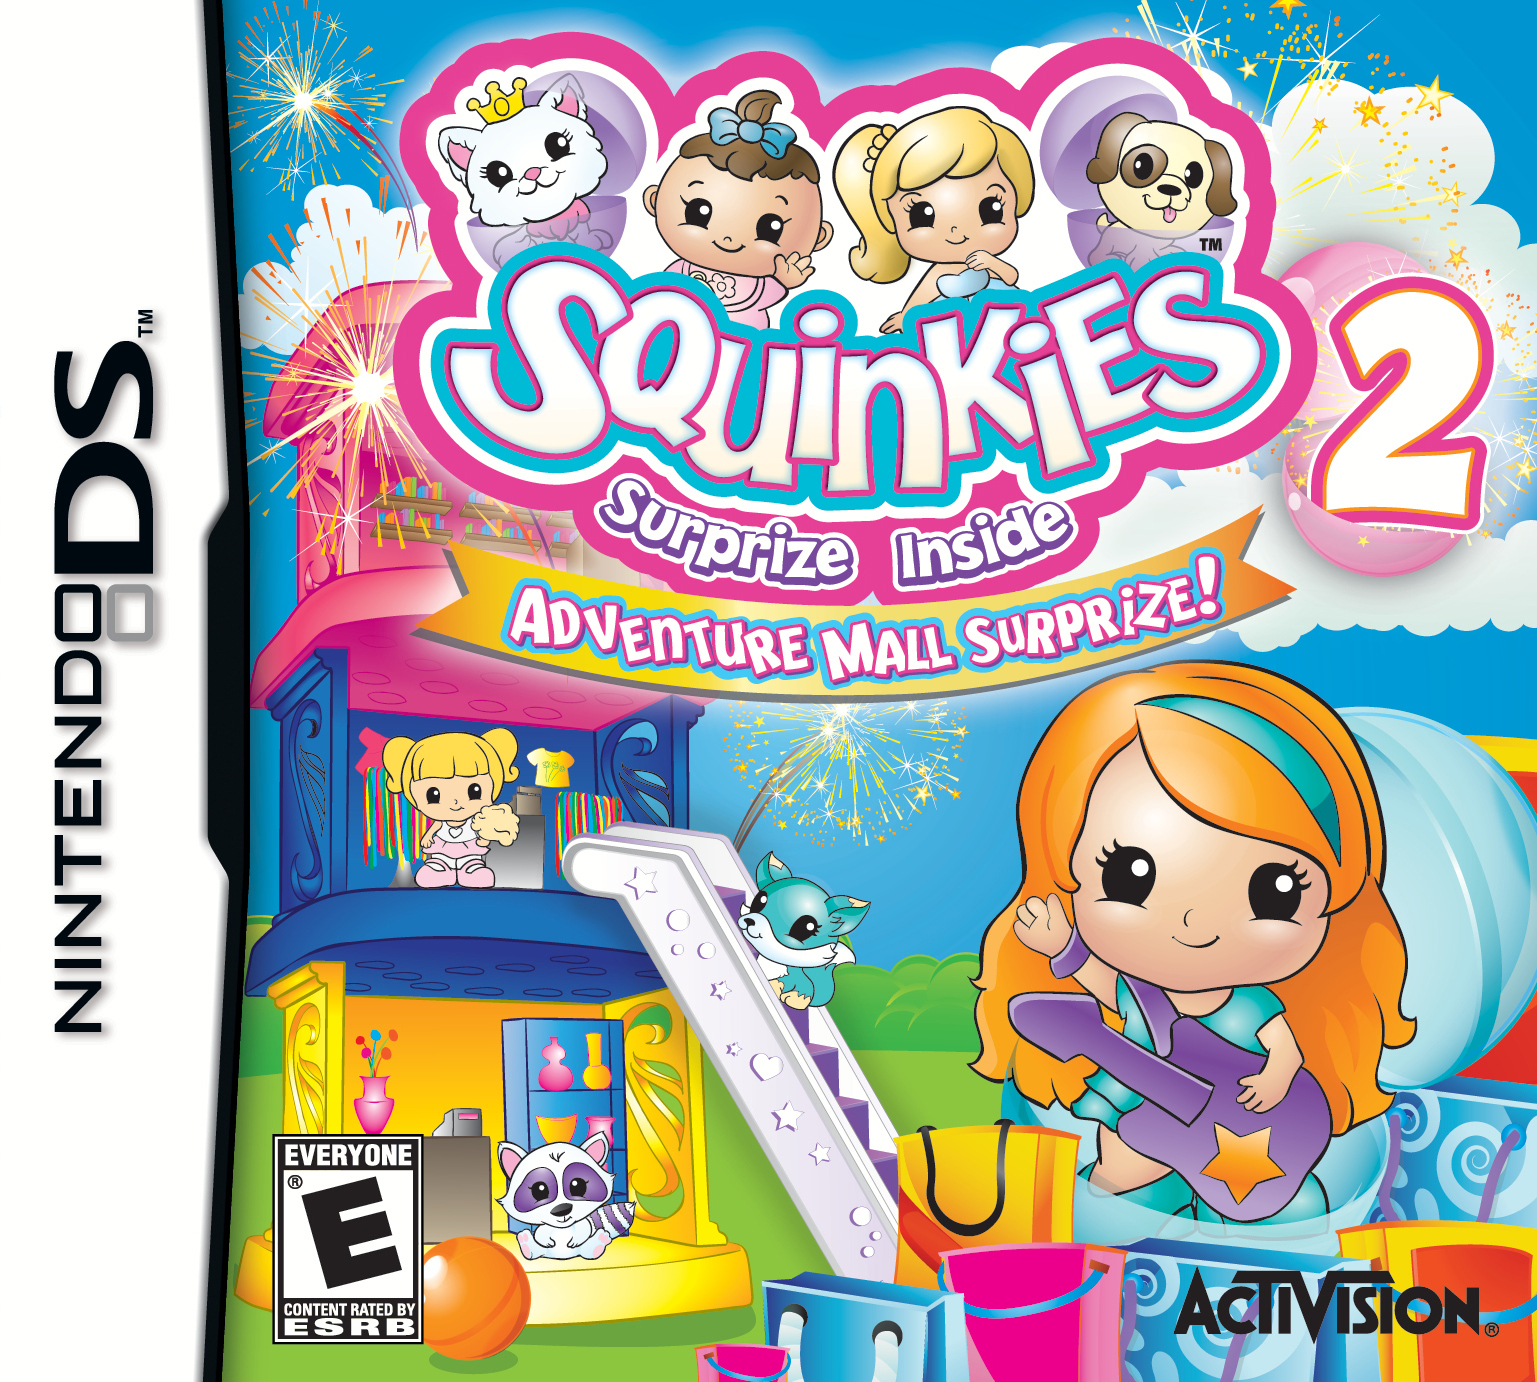 Squinkies Surprize Inside 2